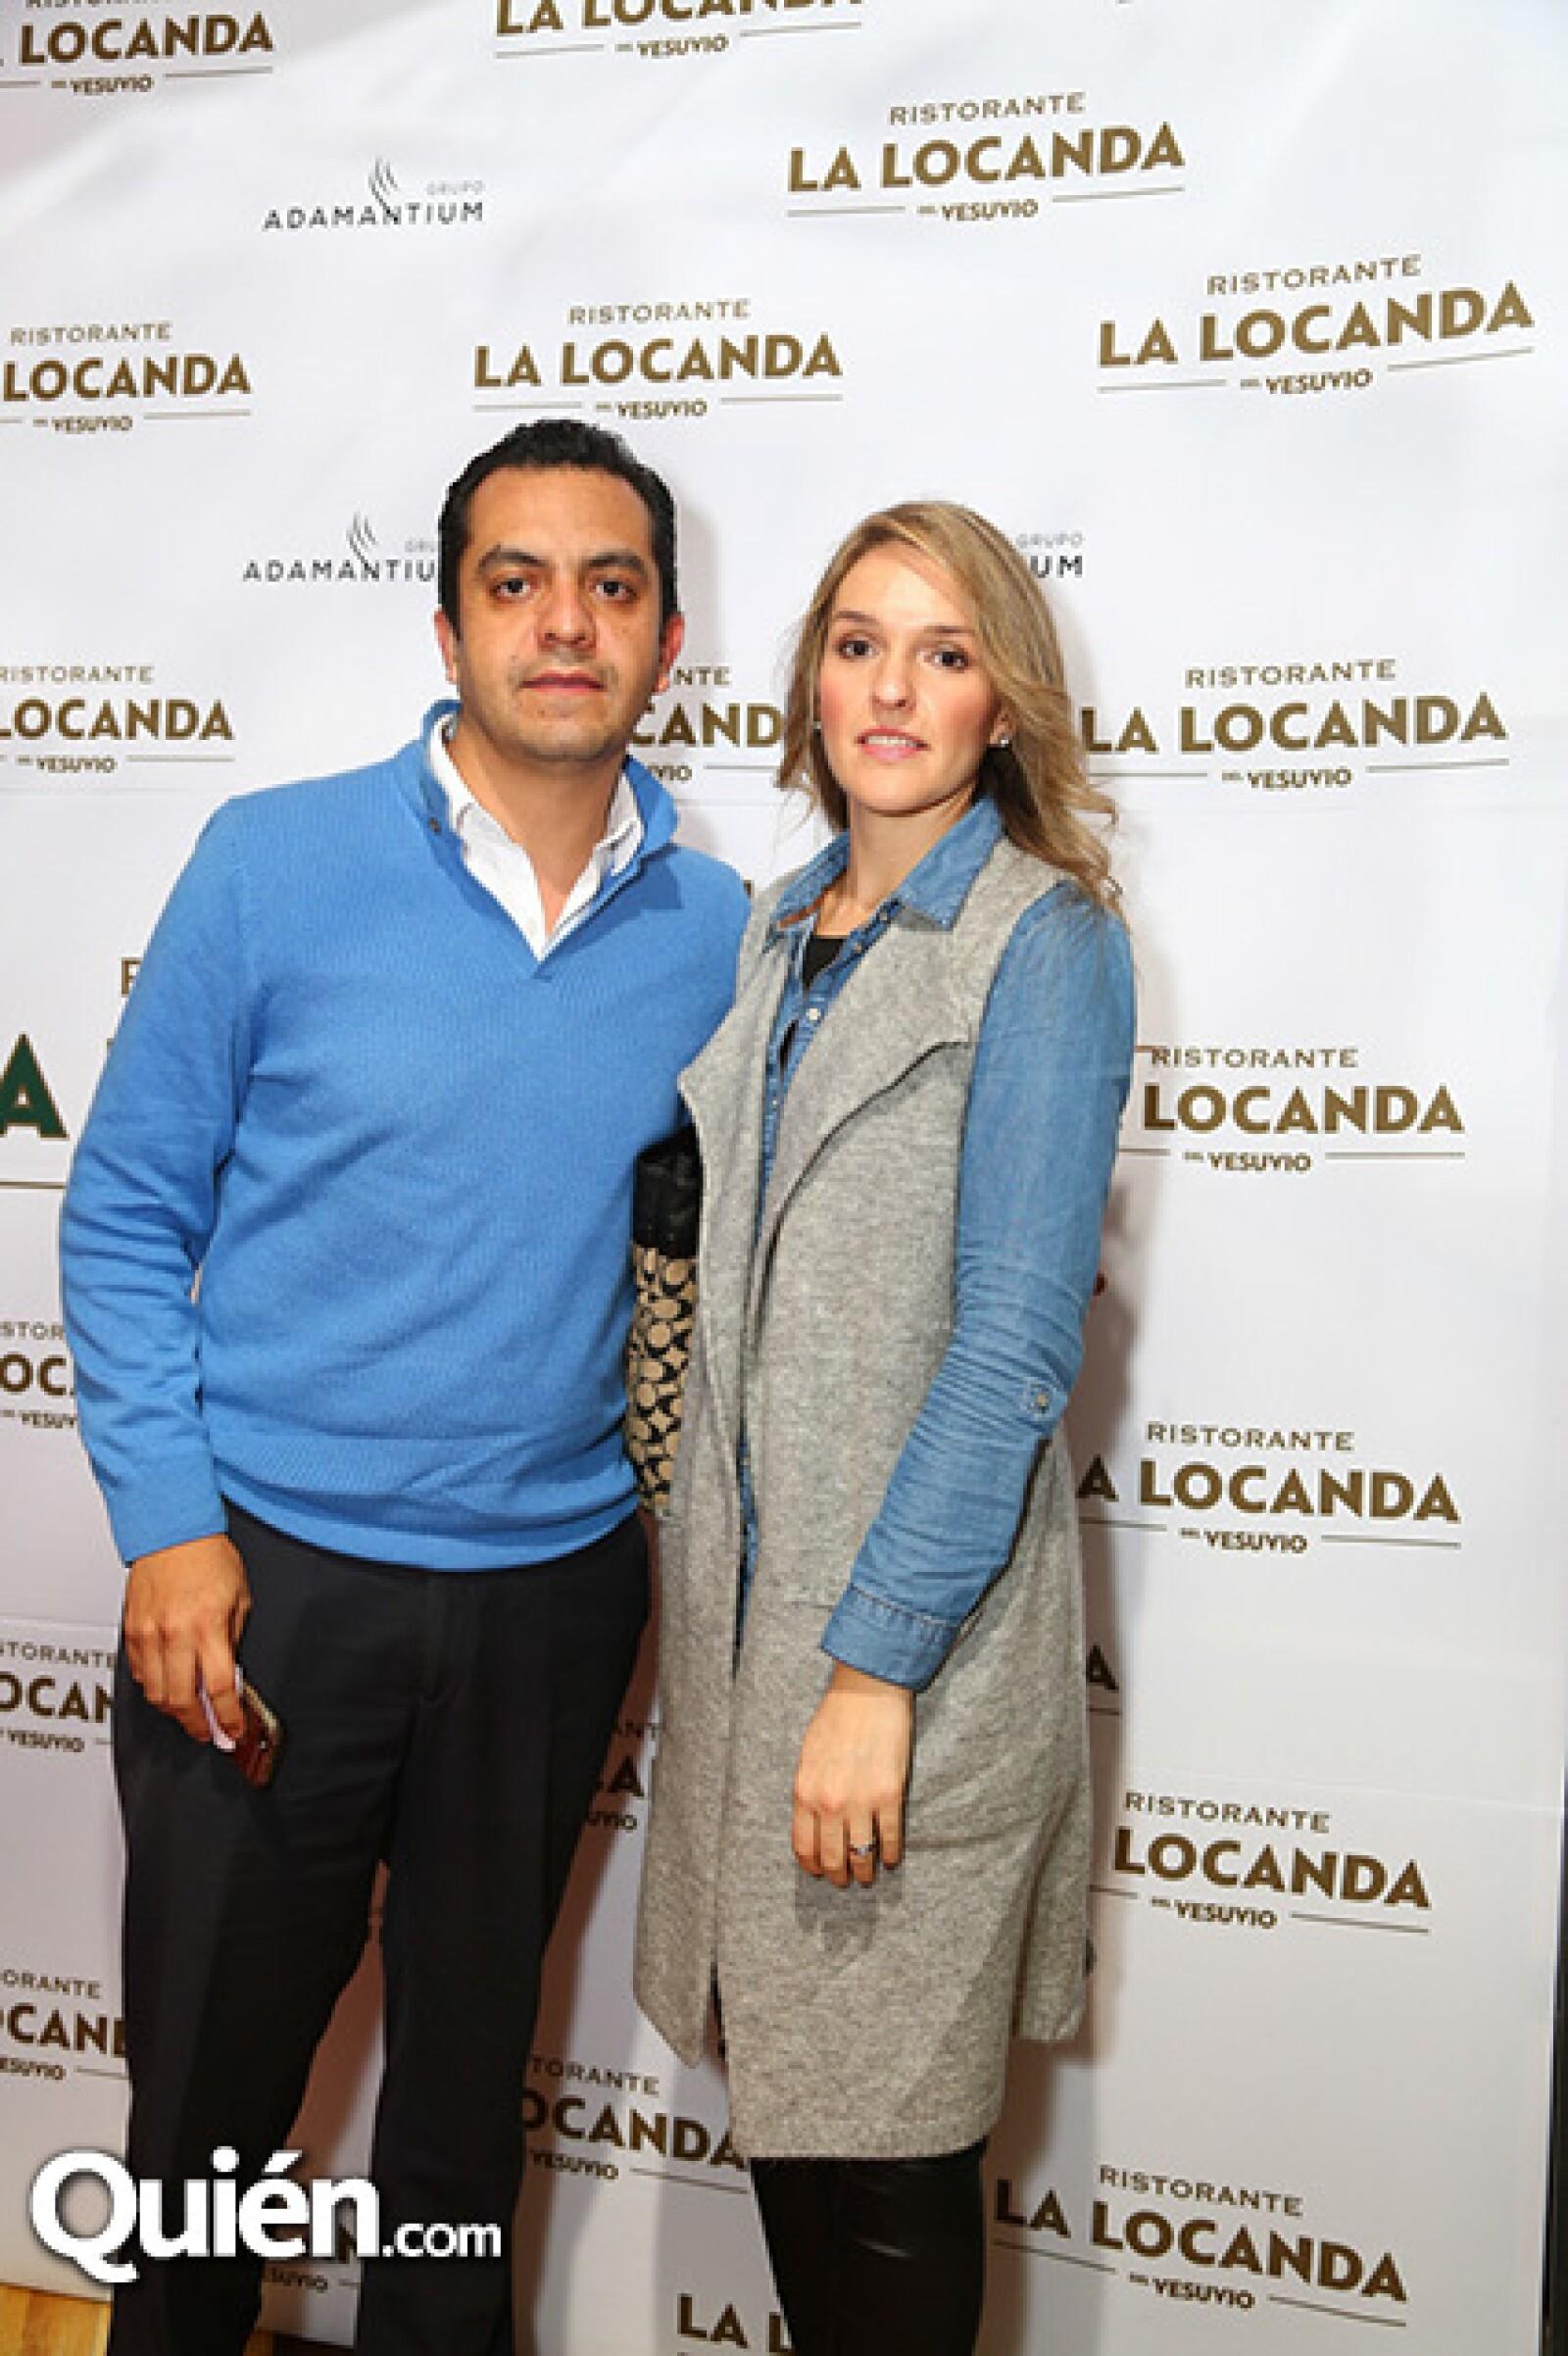 Andrés Guerra y Alejandra Ramos